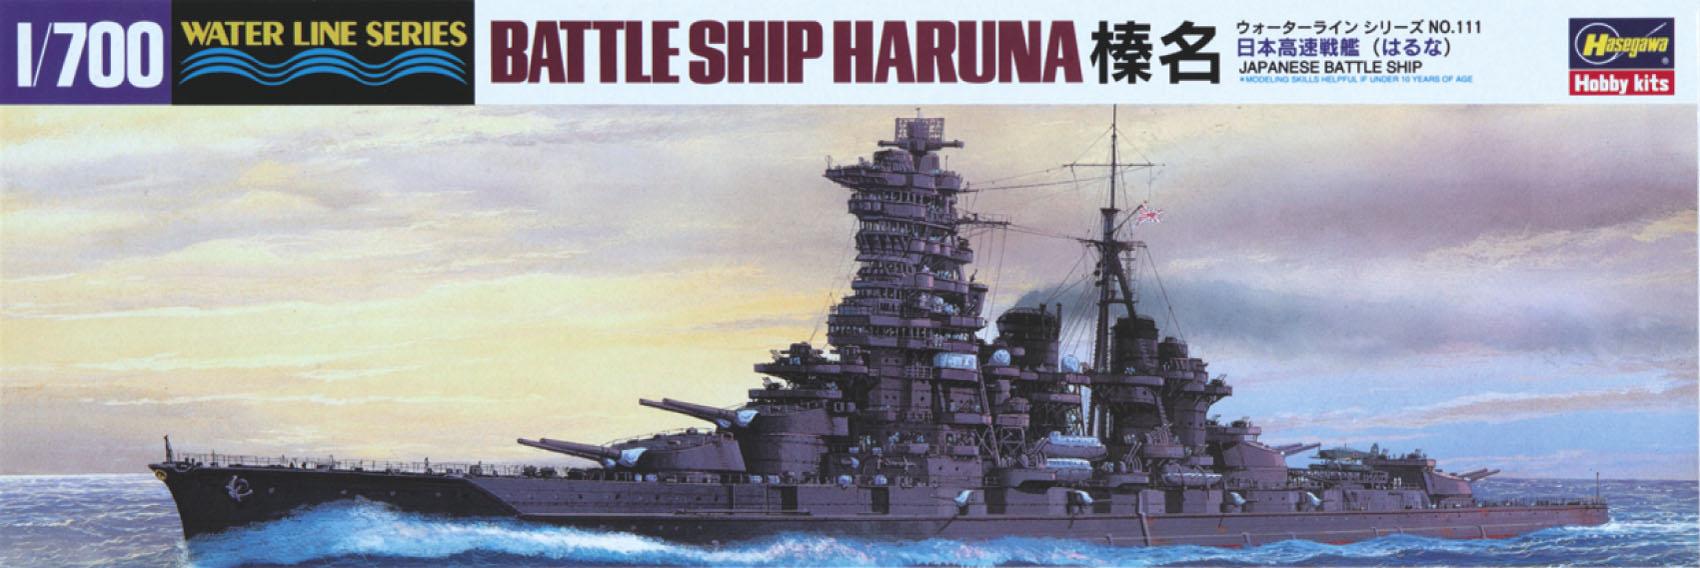 Hasegawa Ijn Battleship Haruna